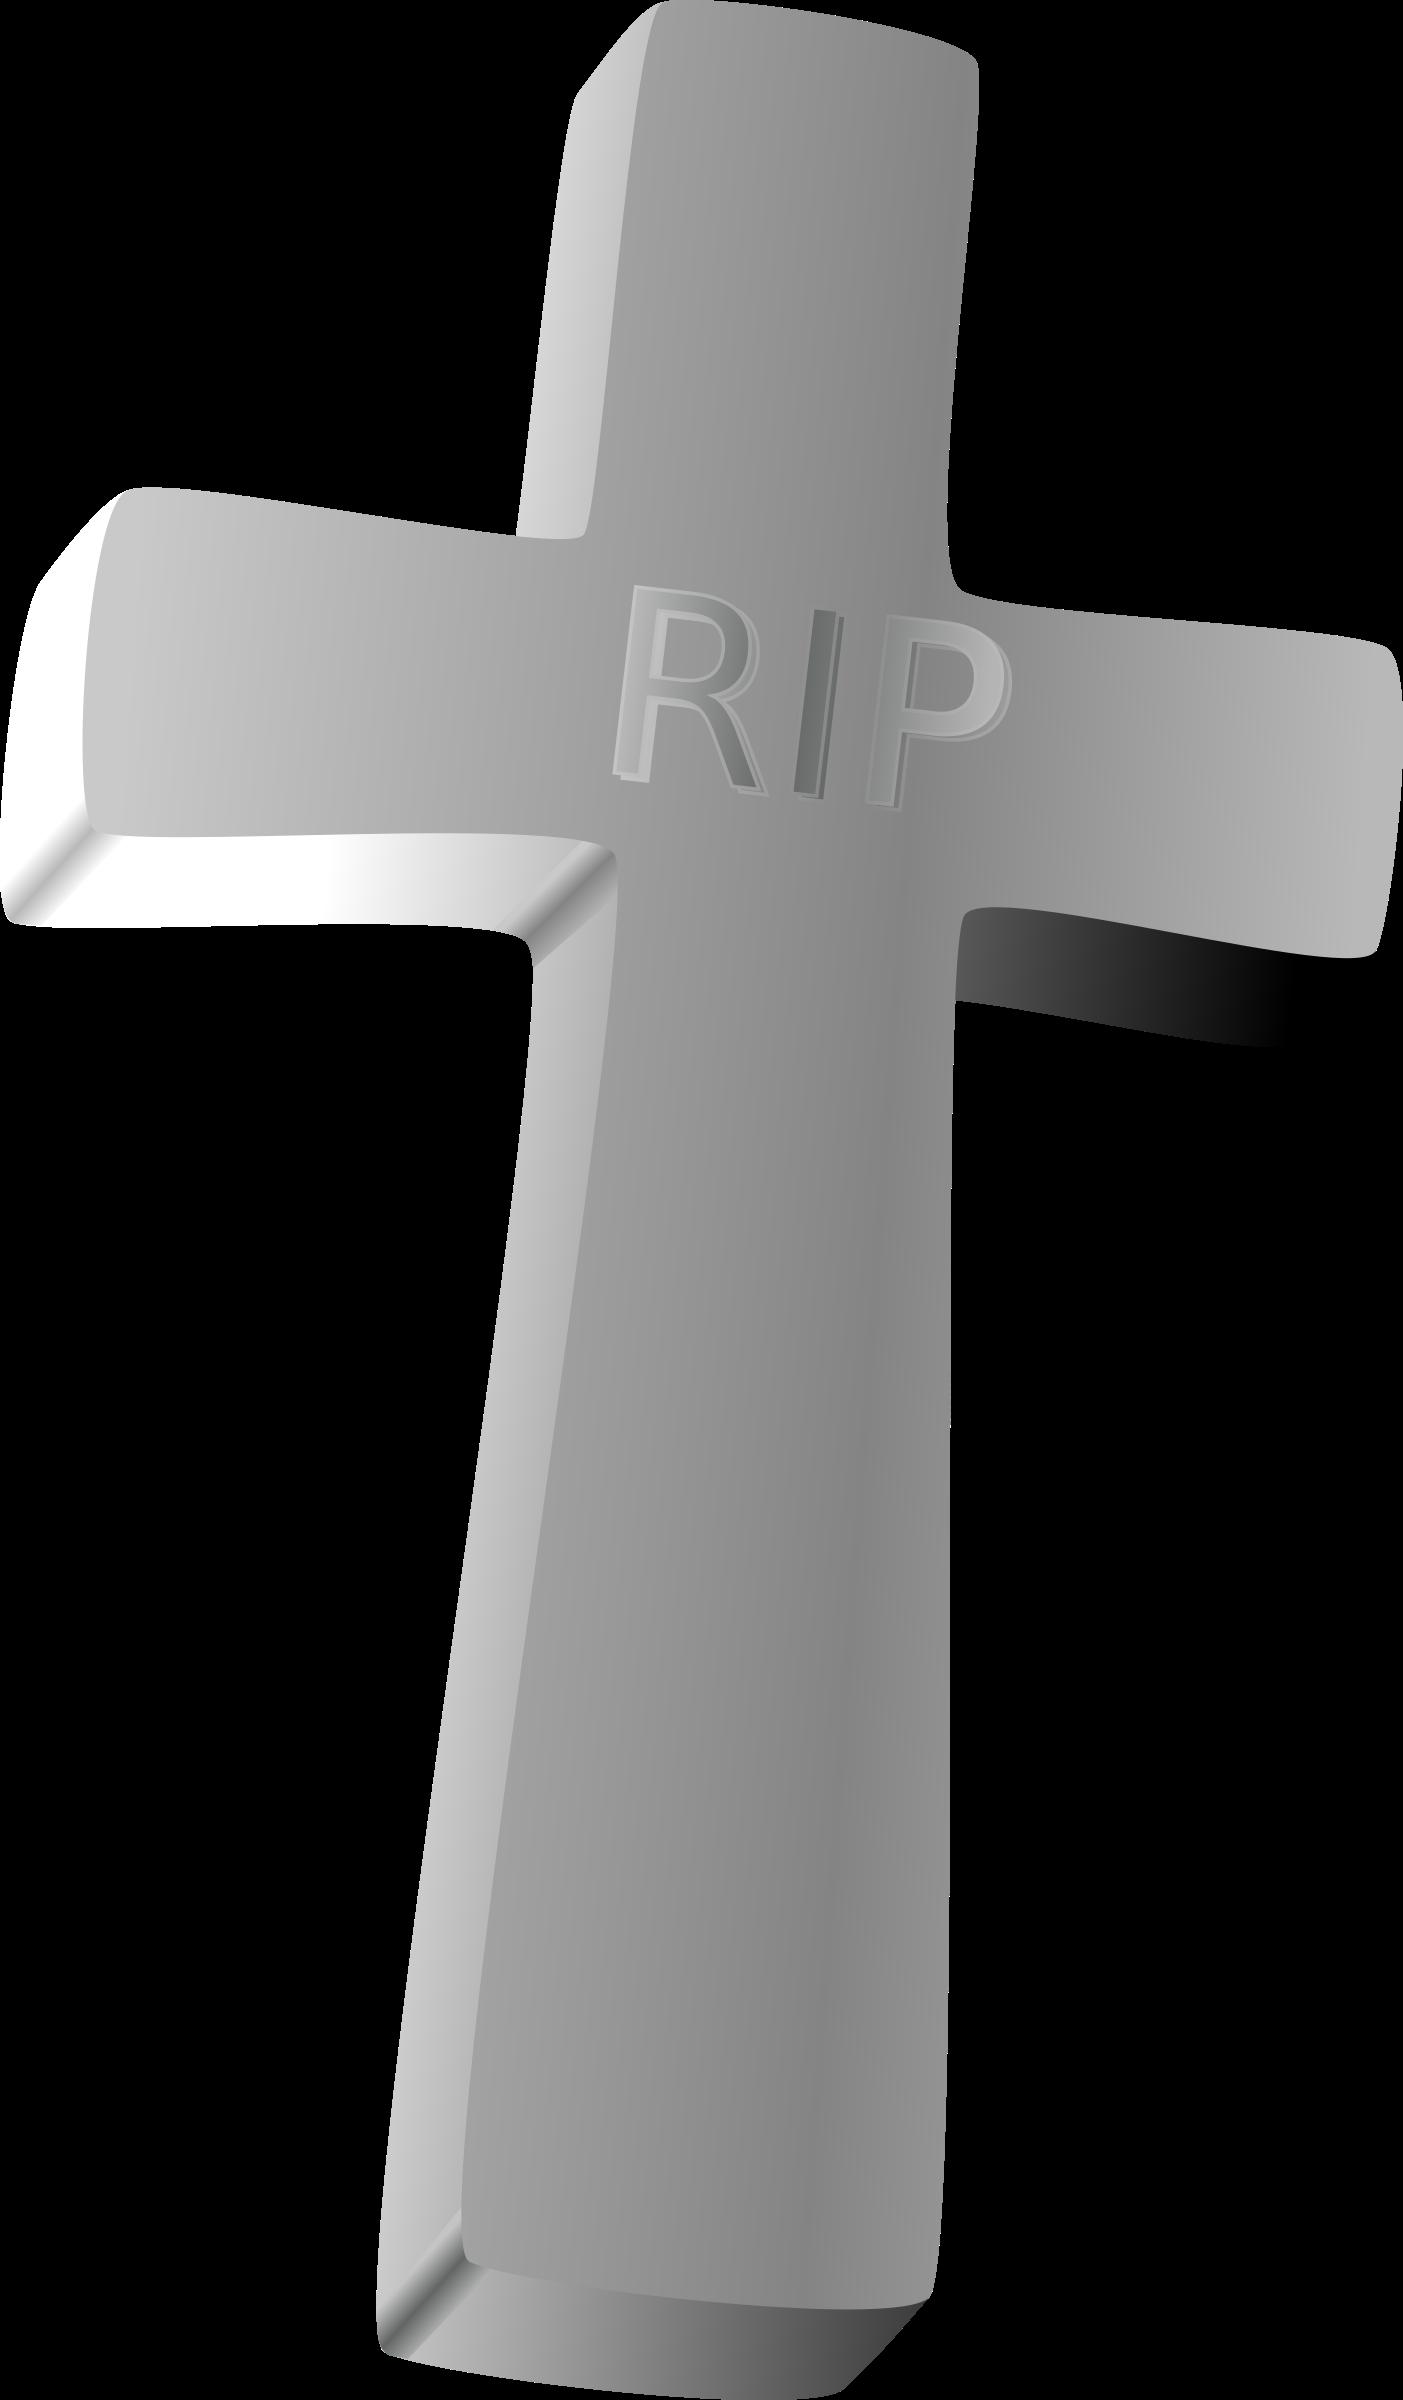 Rip big image png. Cross clipart halloween